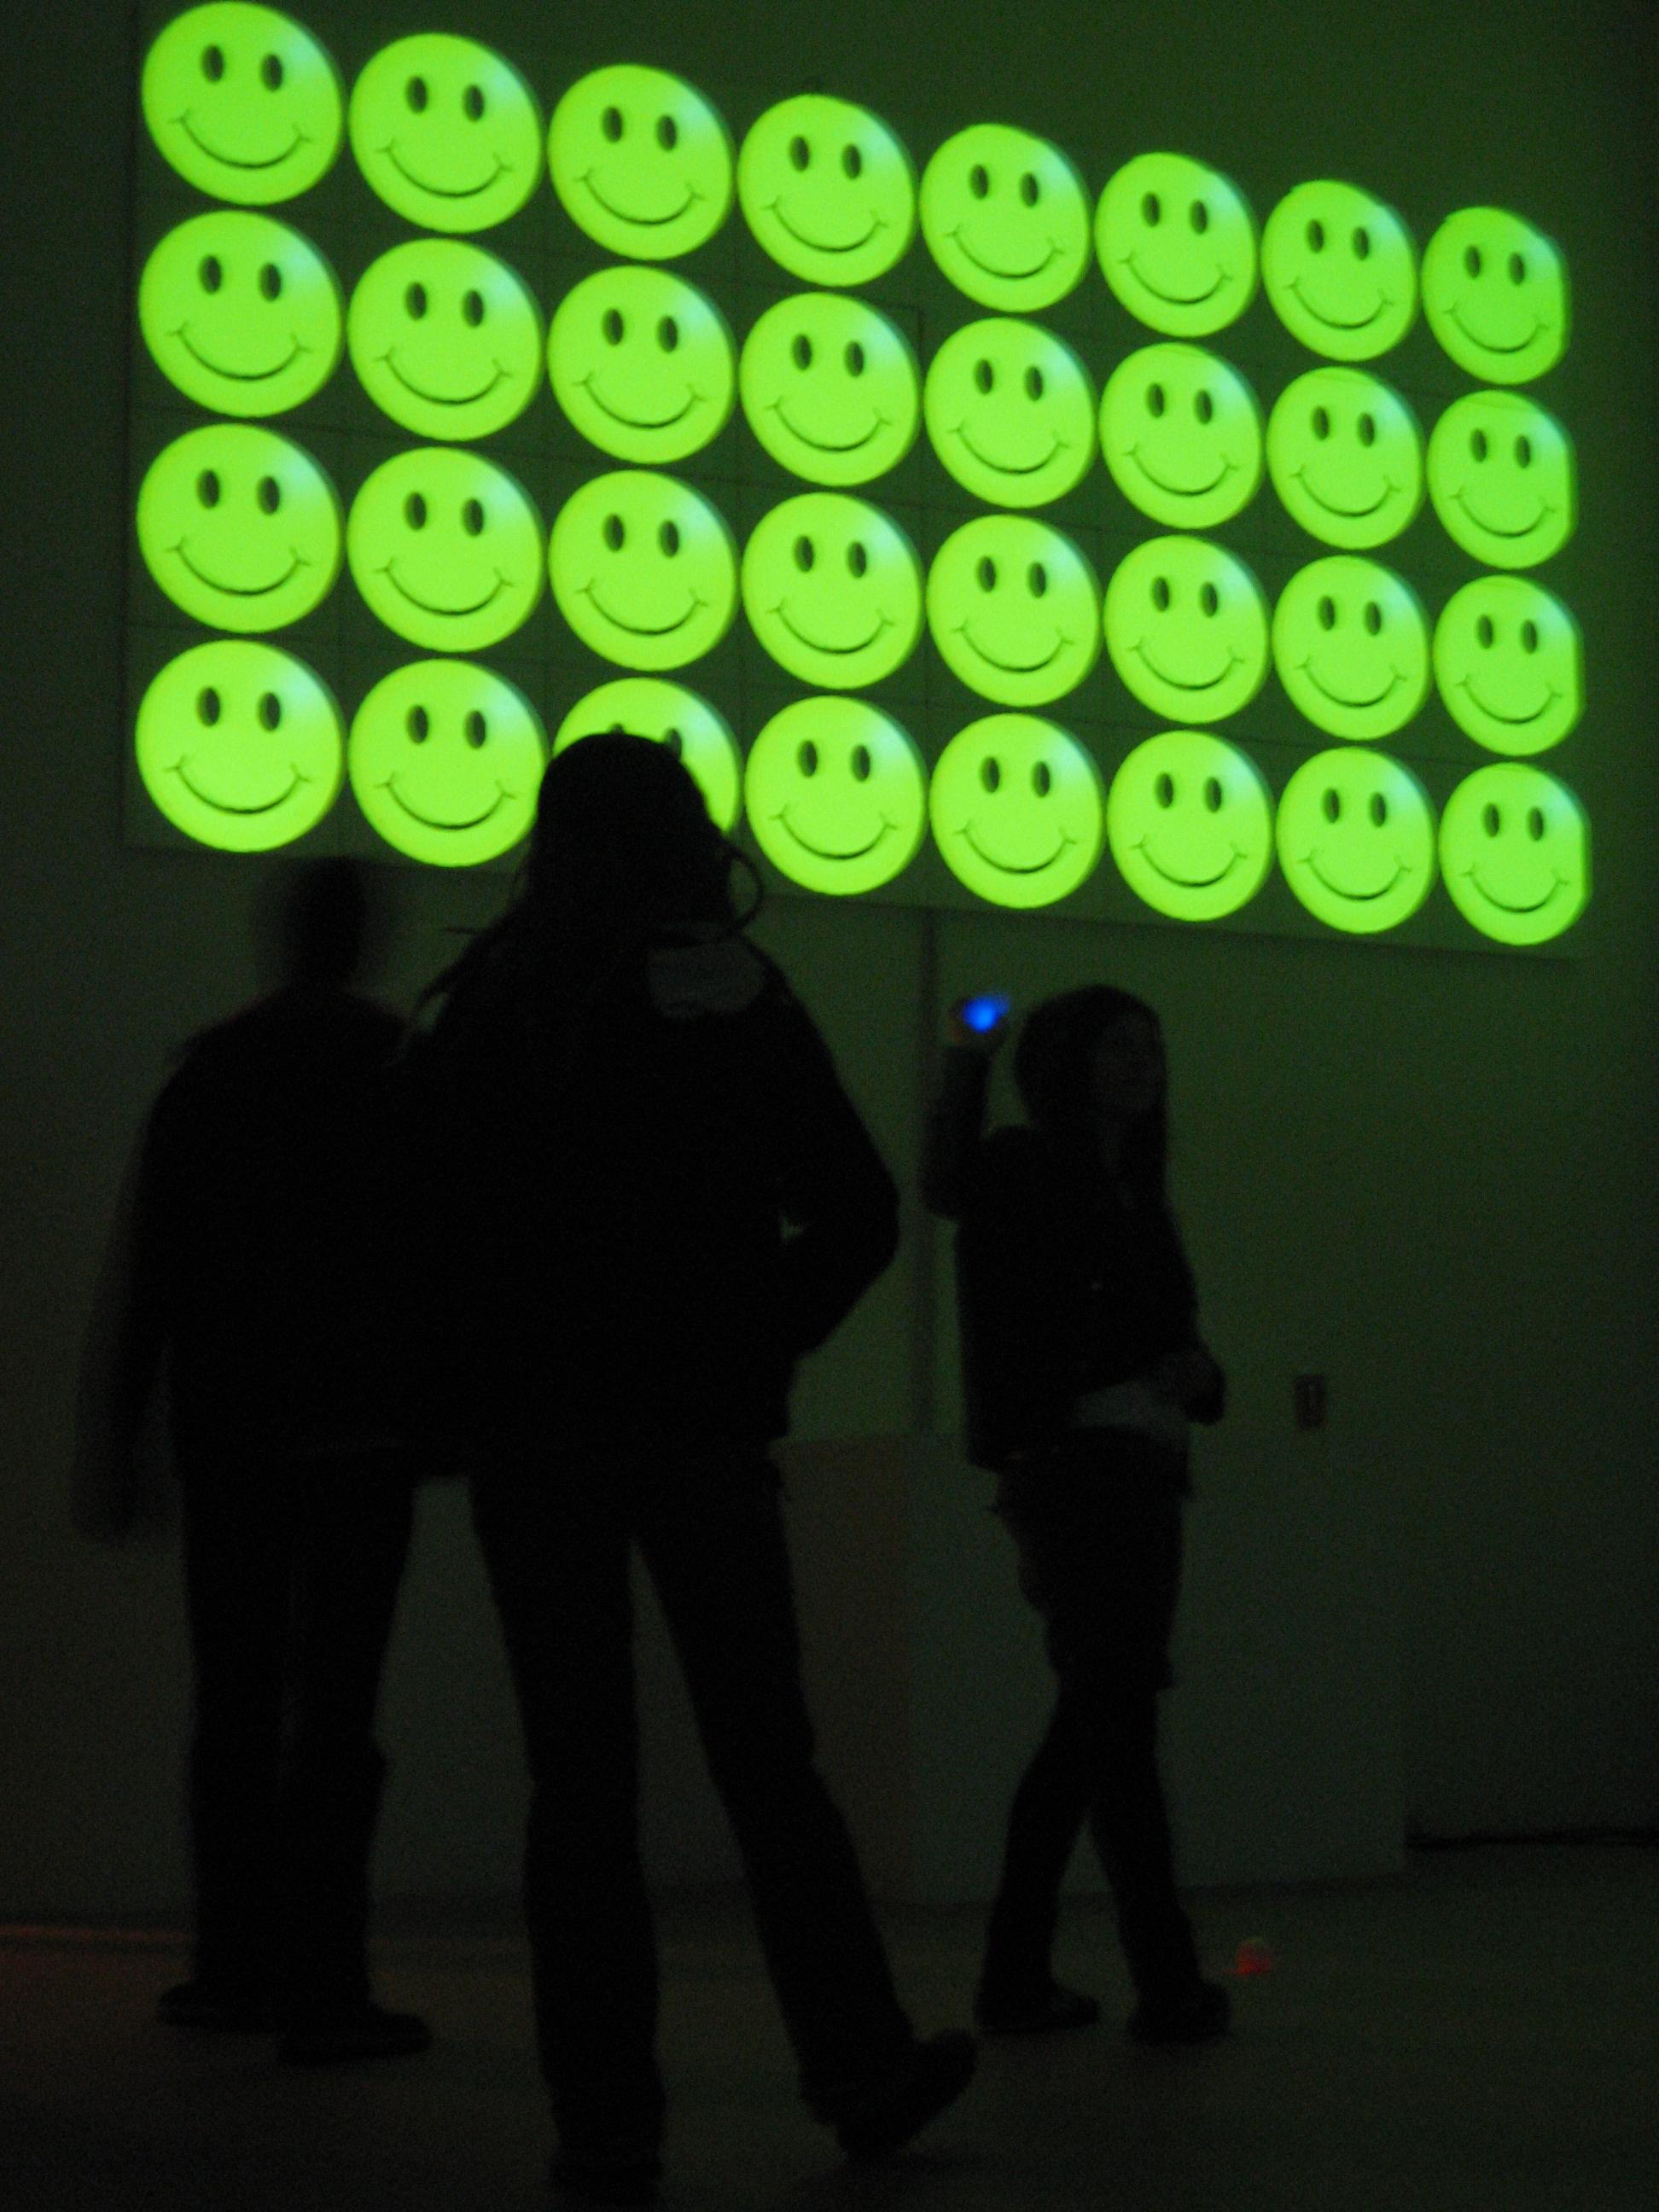 Kammer Machen #2  – annual arts festival, Chemnitz, East Germany, 2008. Work:   [wɔ:l bɔ:l]  - interactive installation .